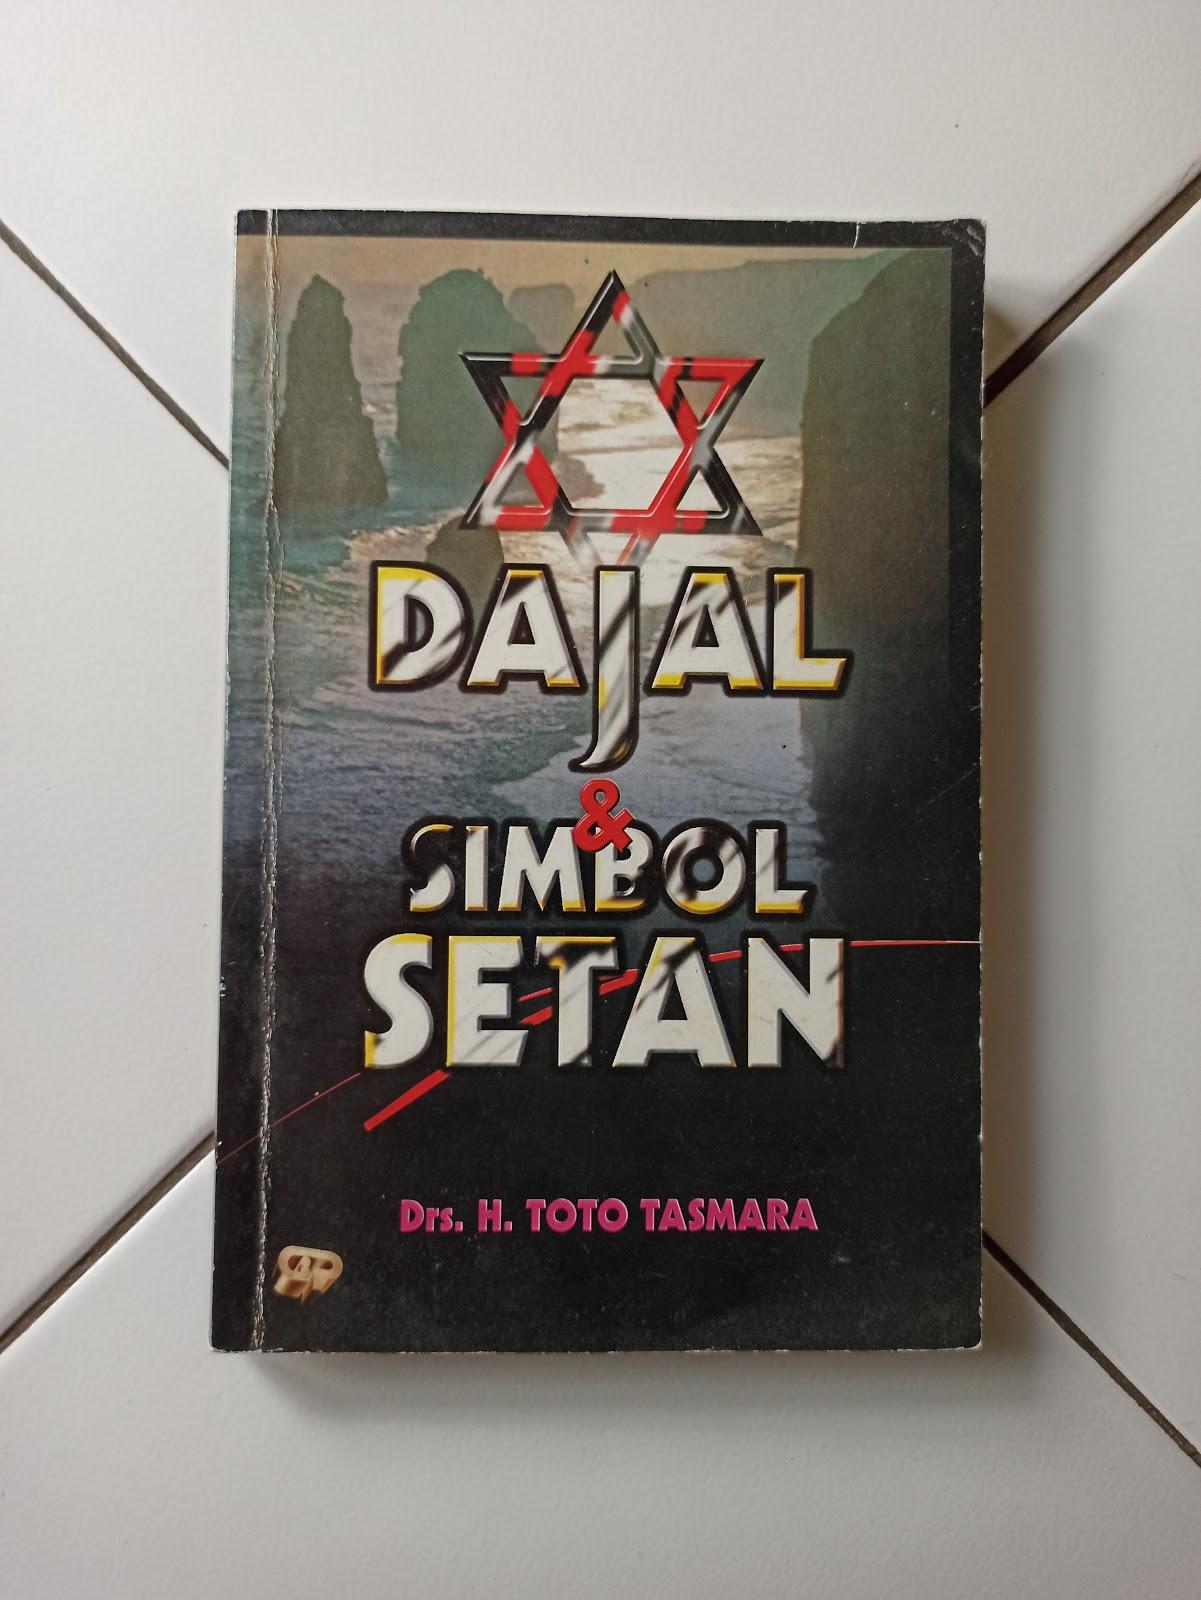 Dajal & Simbol Setan